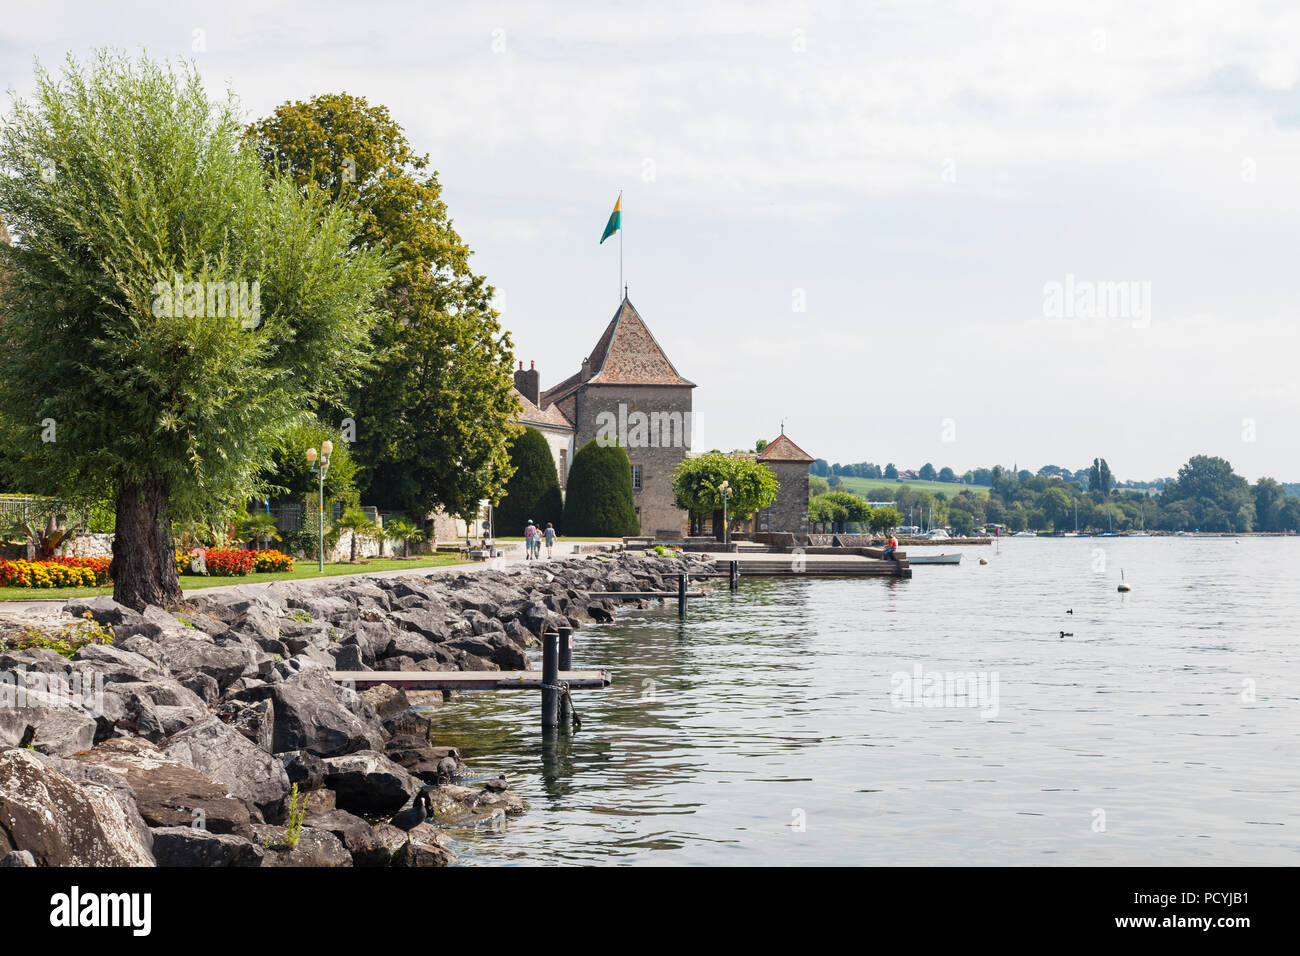 Beautiful promenade along Lake Leman (Geneva lake) waterfront, Rolle Castle and gardens in Rolle, La Côte Region, Vaud, Switzerland on hot summer day - Stock Image